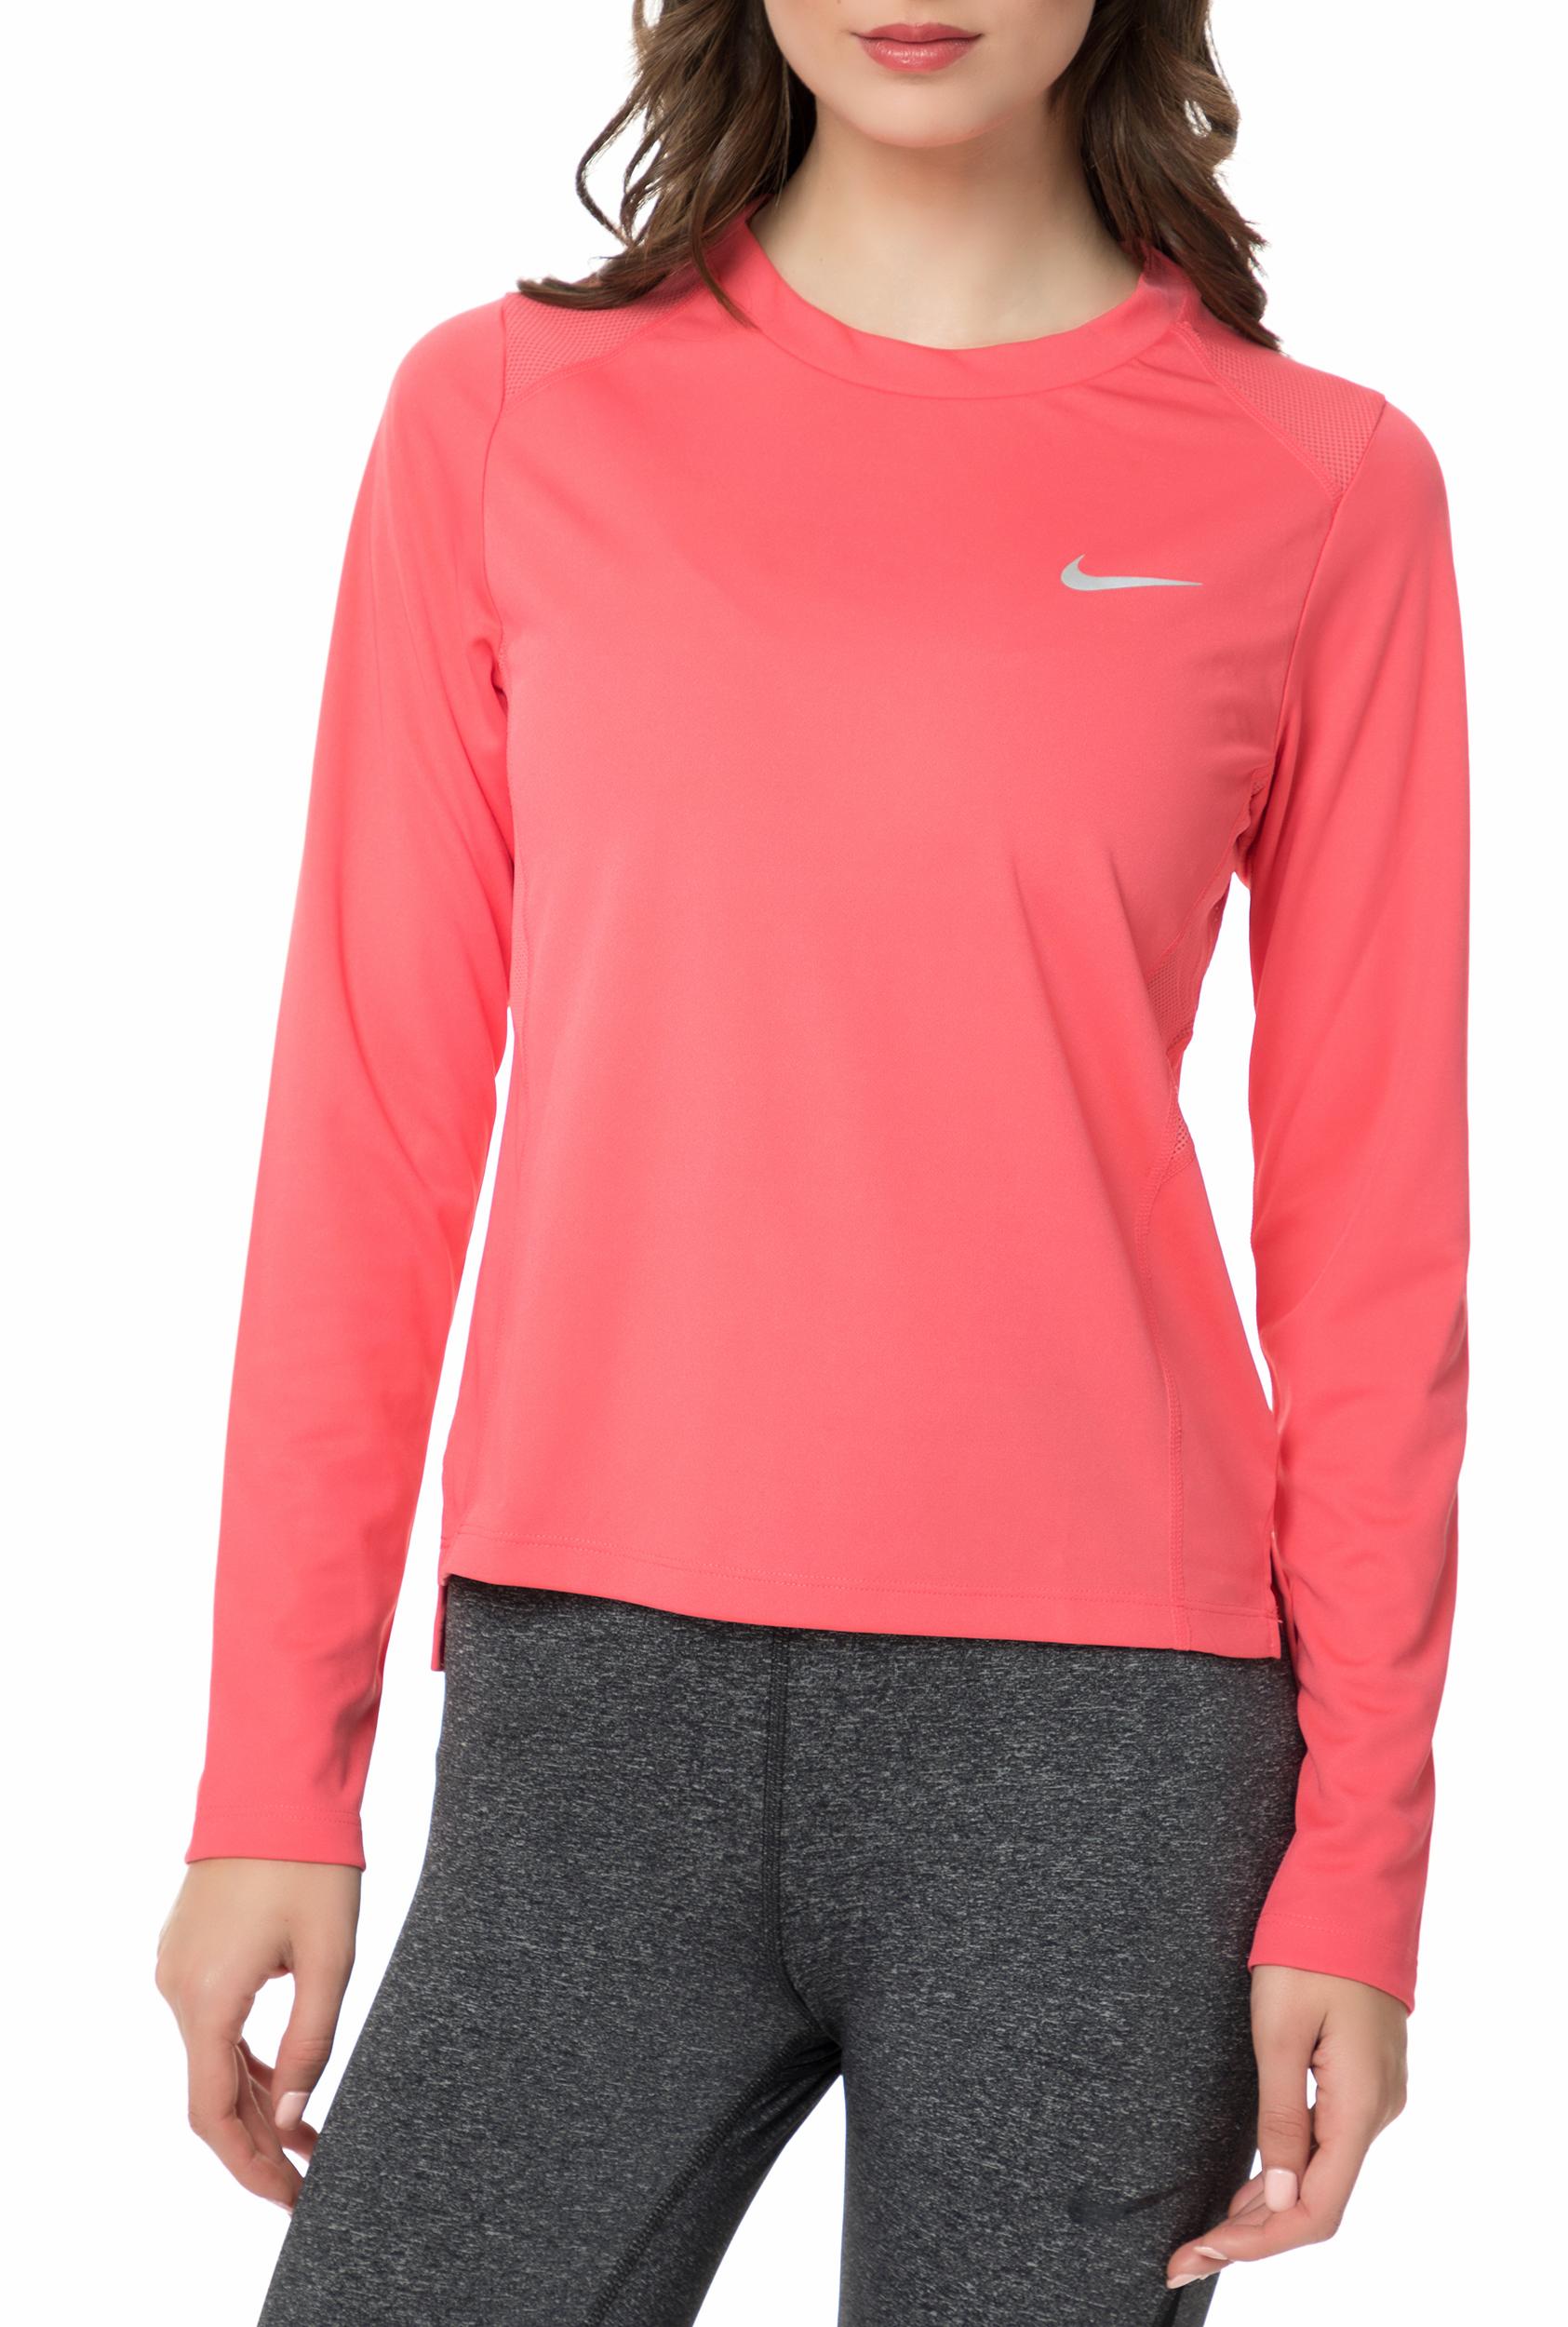 NIKE - Γυναικεία μακρυμάνικη μπλούζα NIKE MILER TOP LS ροζ 14087198e00